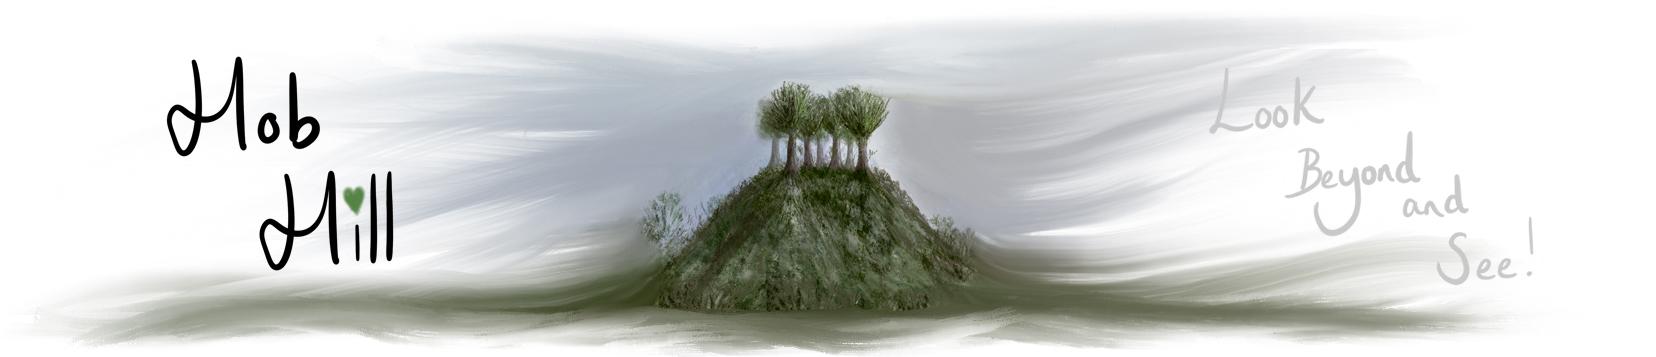 Hob Hill